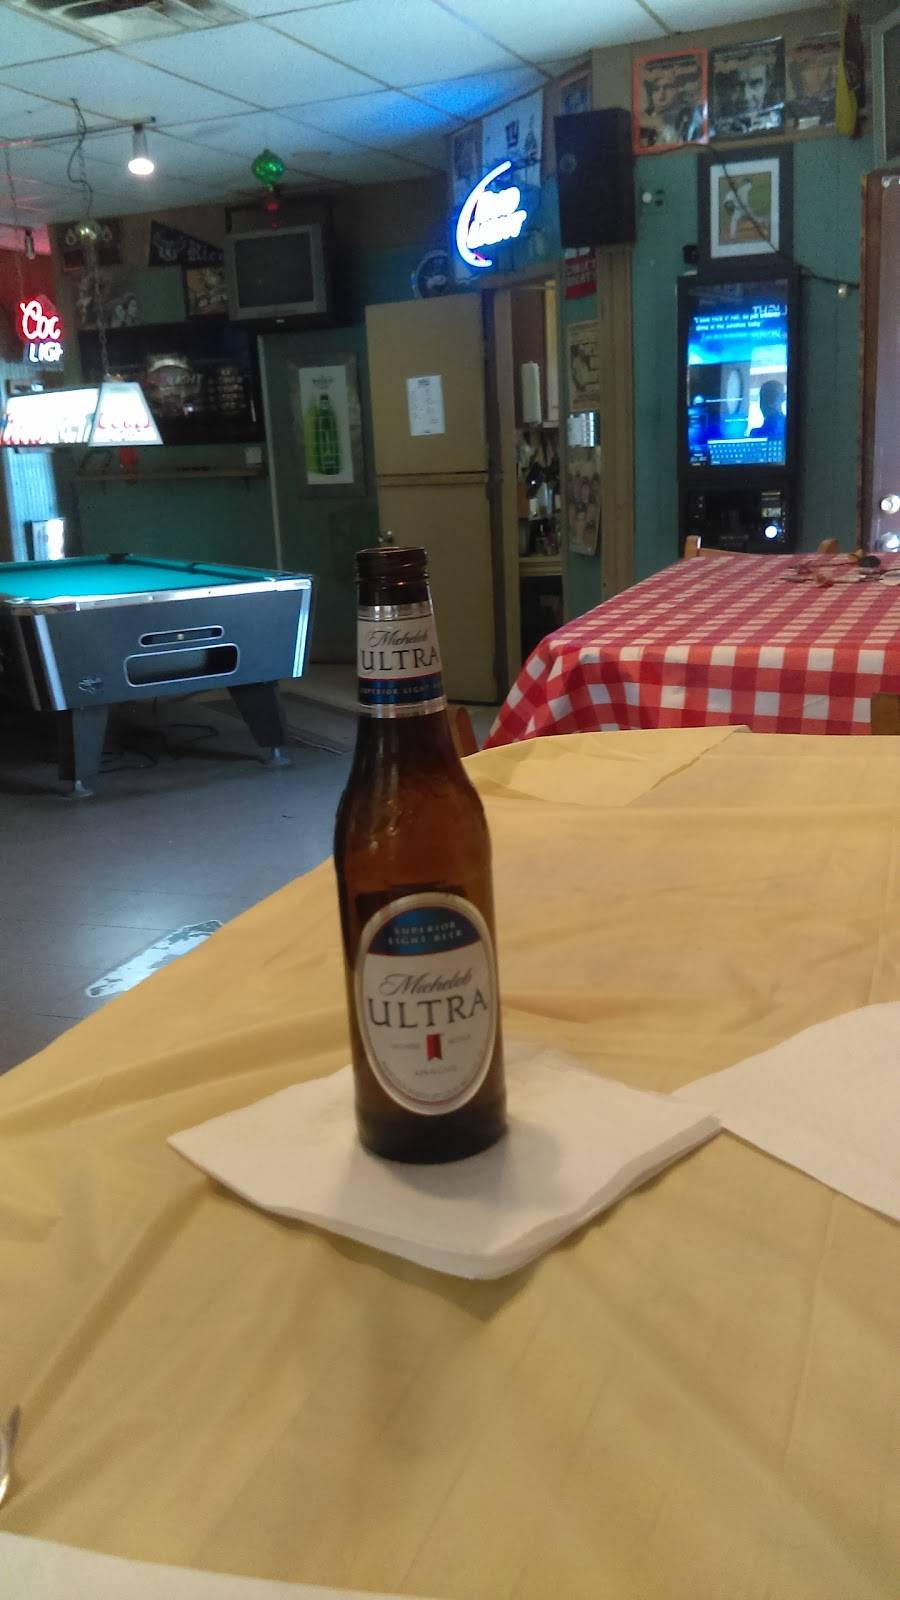 Cee & Jay Tavern | restaurant | 6800 Polk St, Guttenberg, NJ 07093, USA